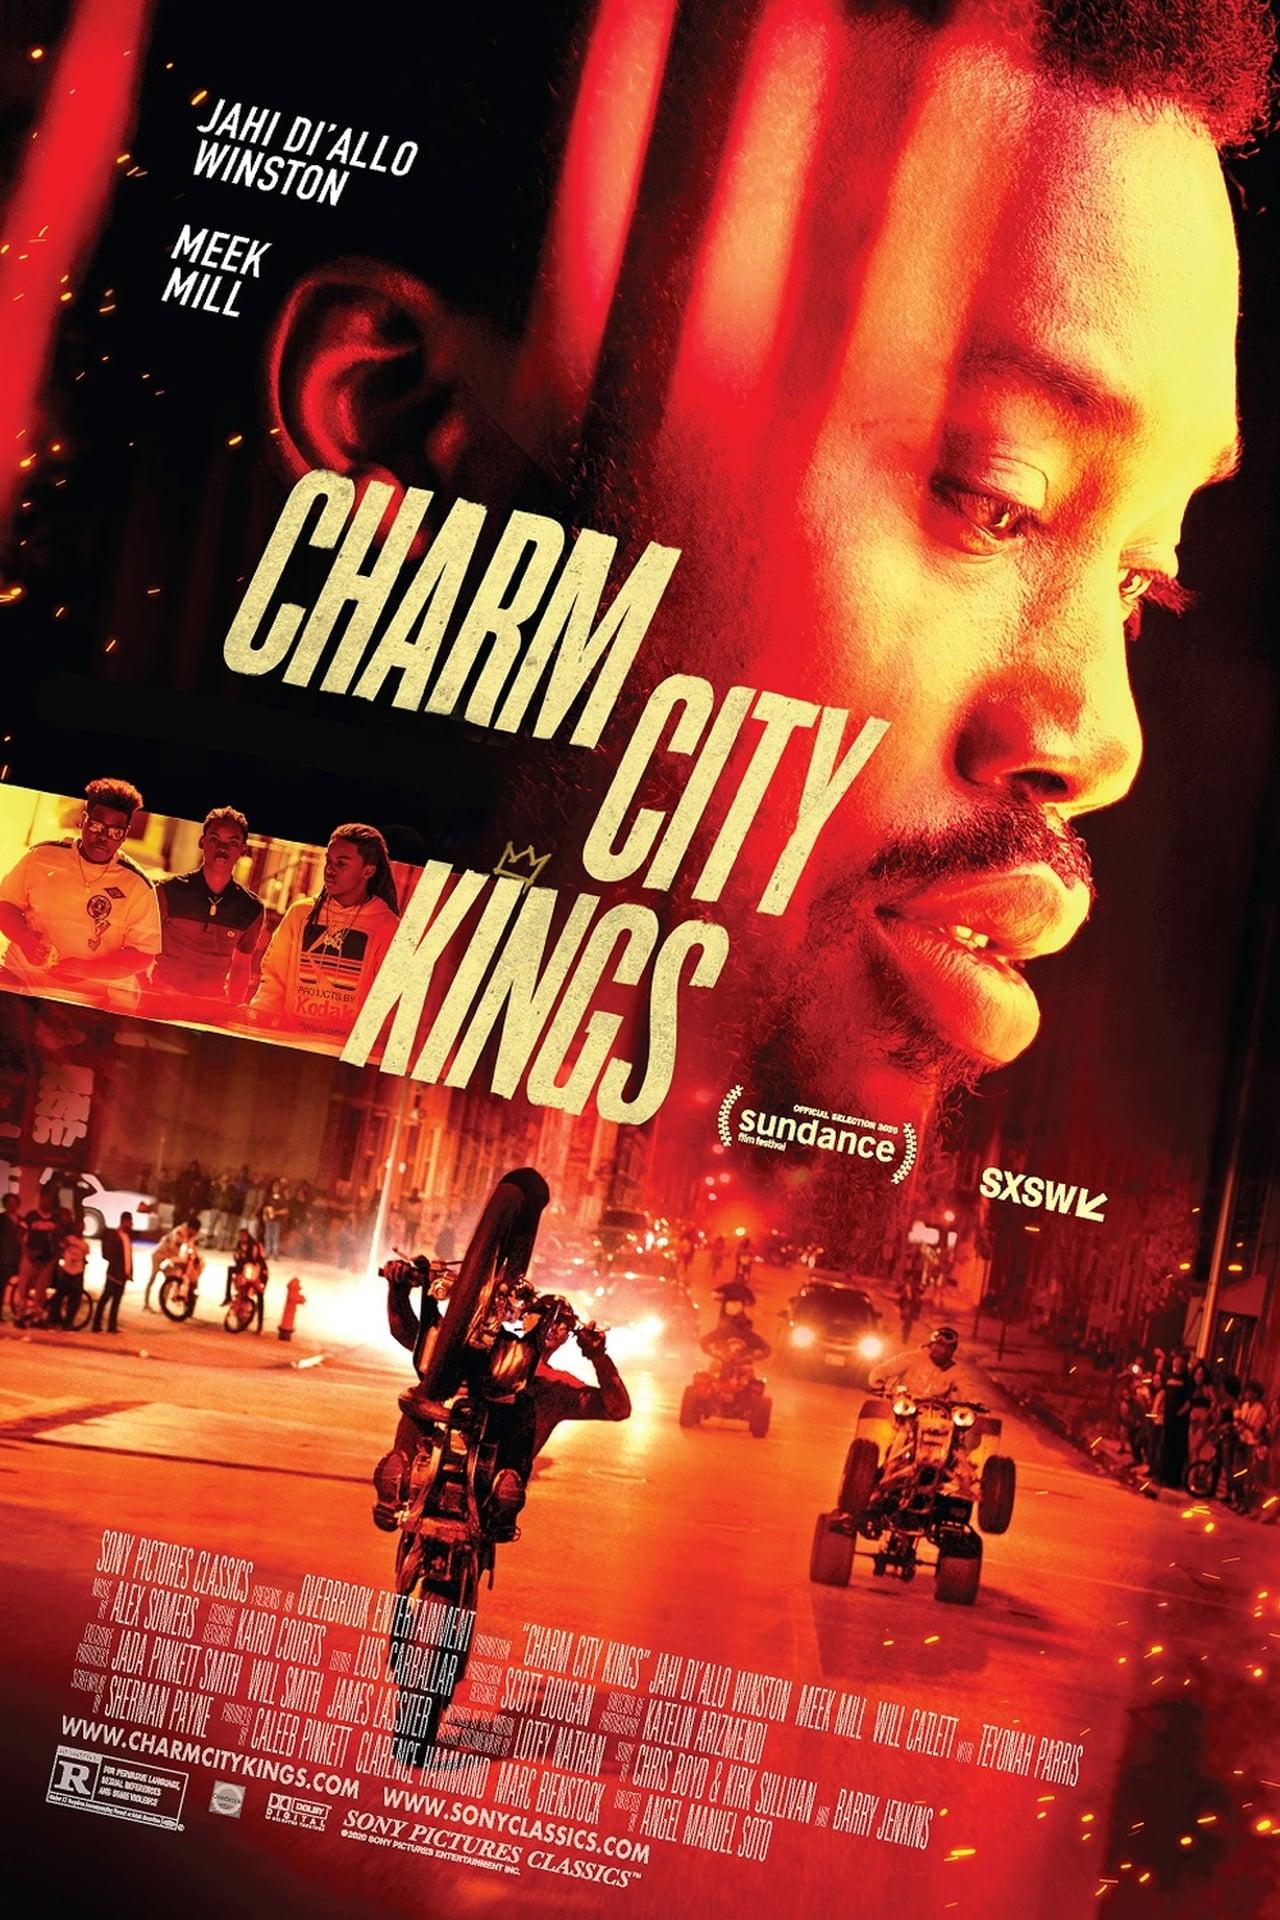 Charm City Kings 2020 Full Movie Online Free 123movies